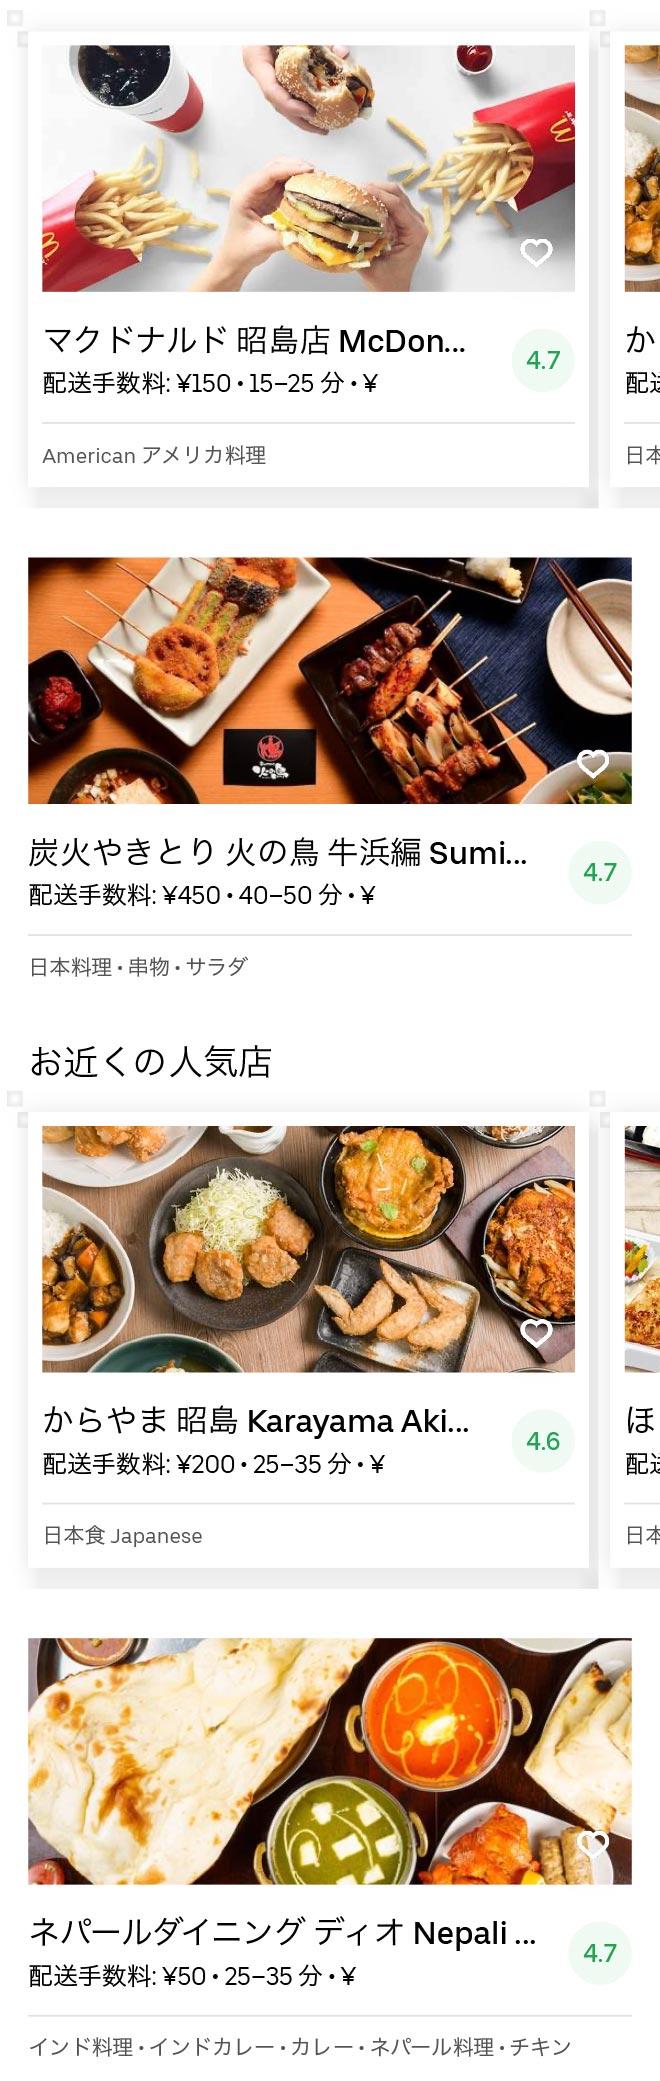 Akishima menu 2004 01